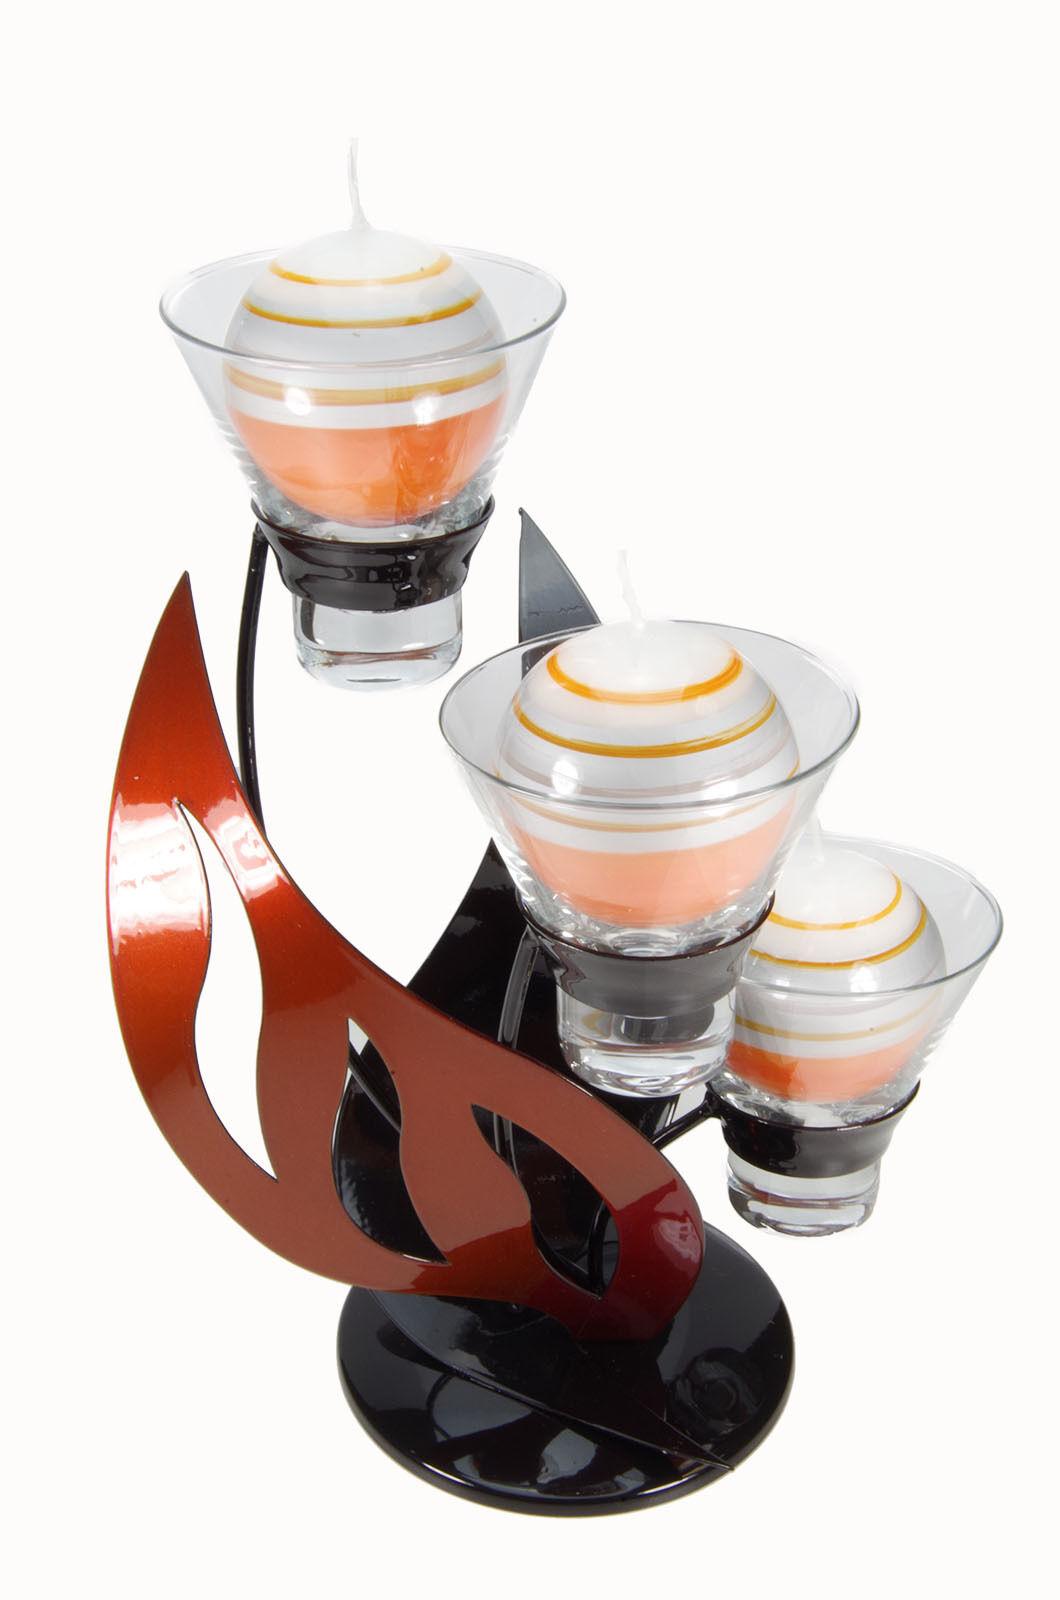 Kerzenständer Metall modern amber Orange schwarz inkl. 3 Kerzen 27,5 x 22 cm